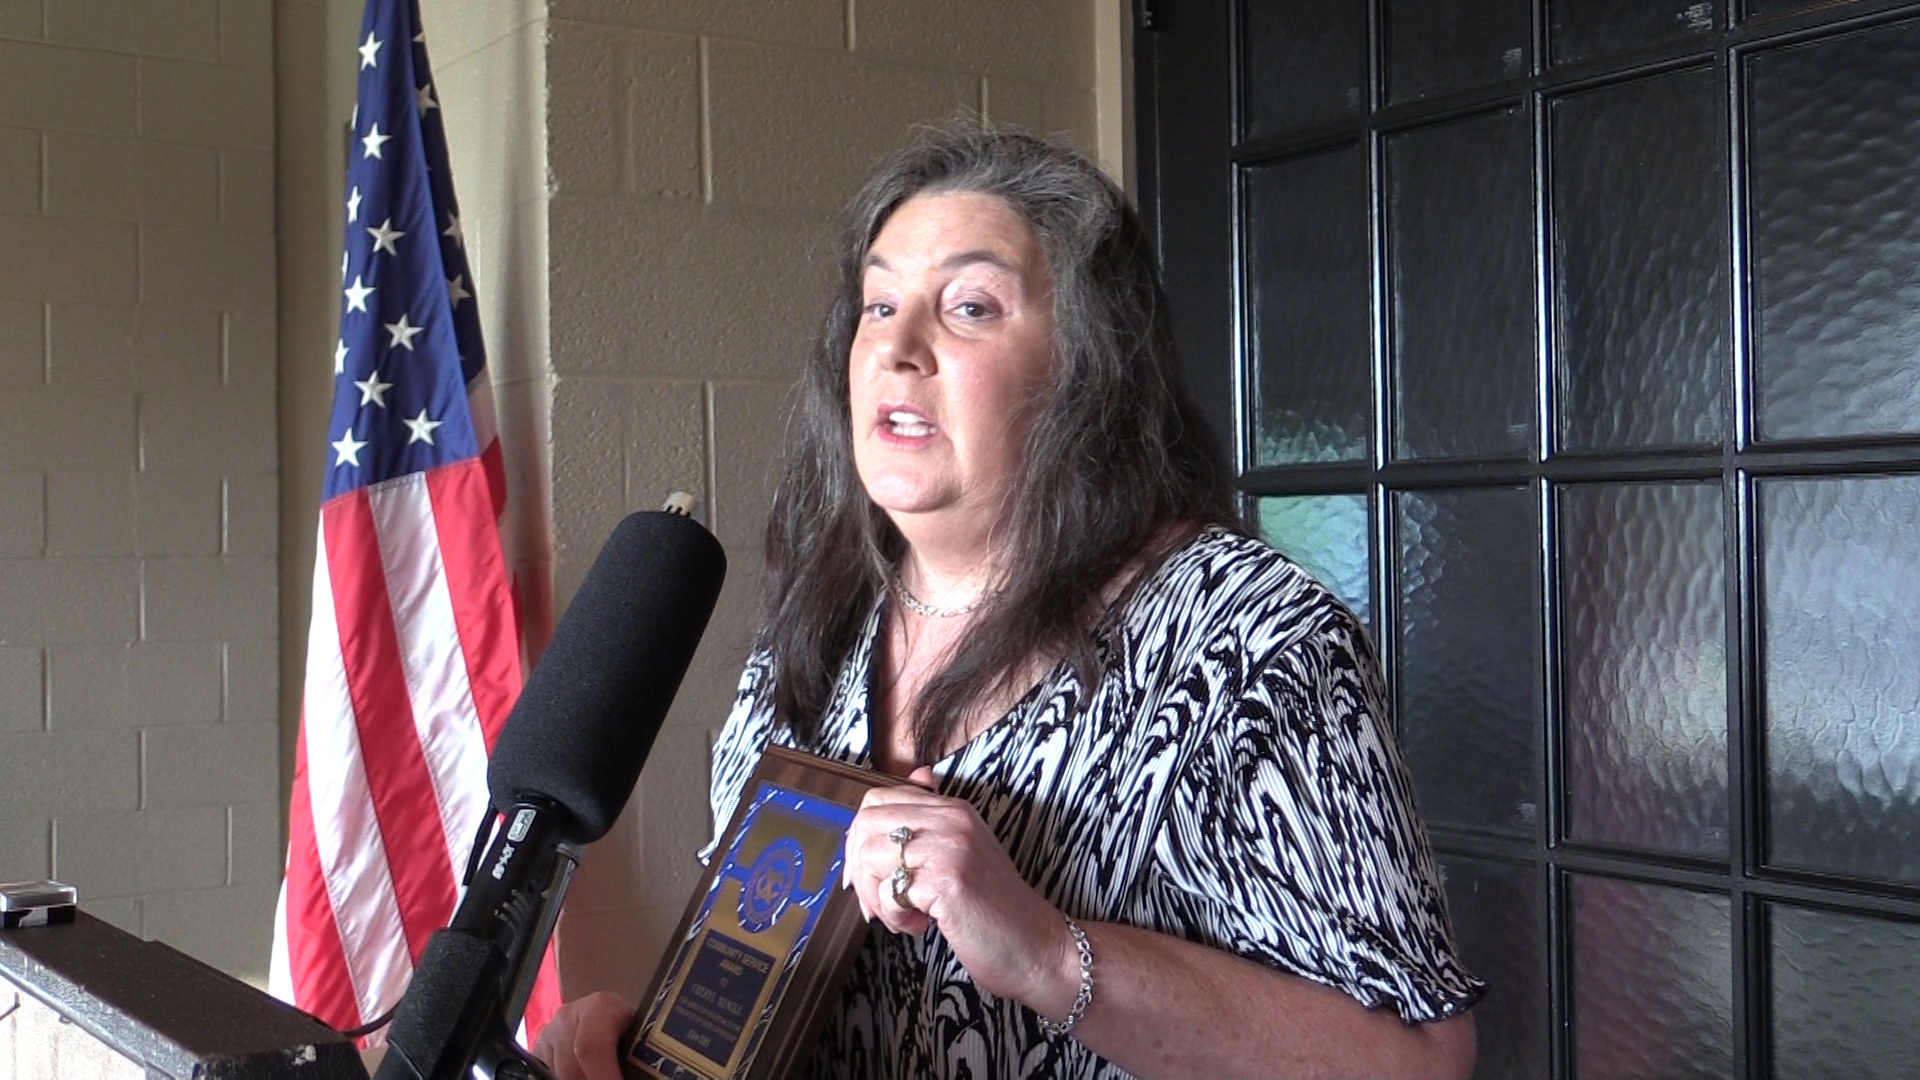 Cheryl Mingle receives the Exchange Community Service Award